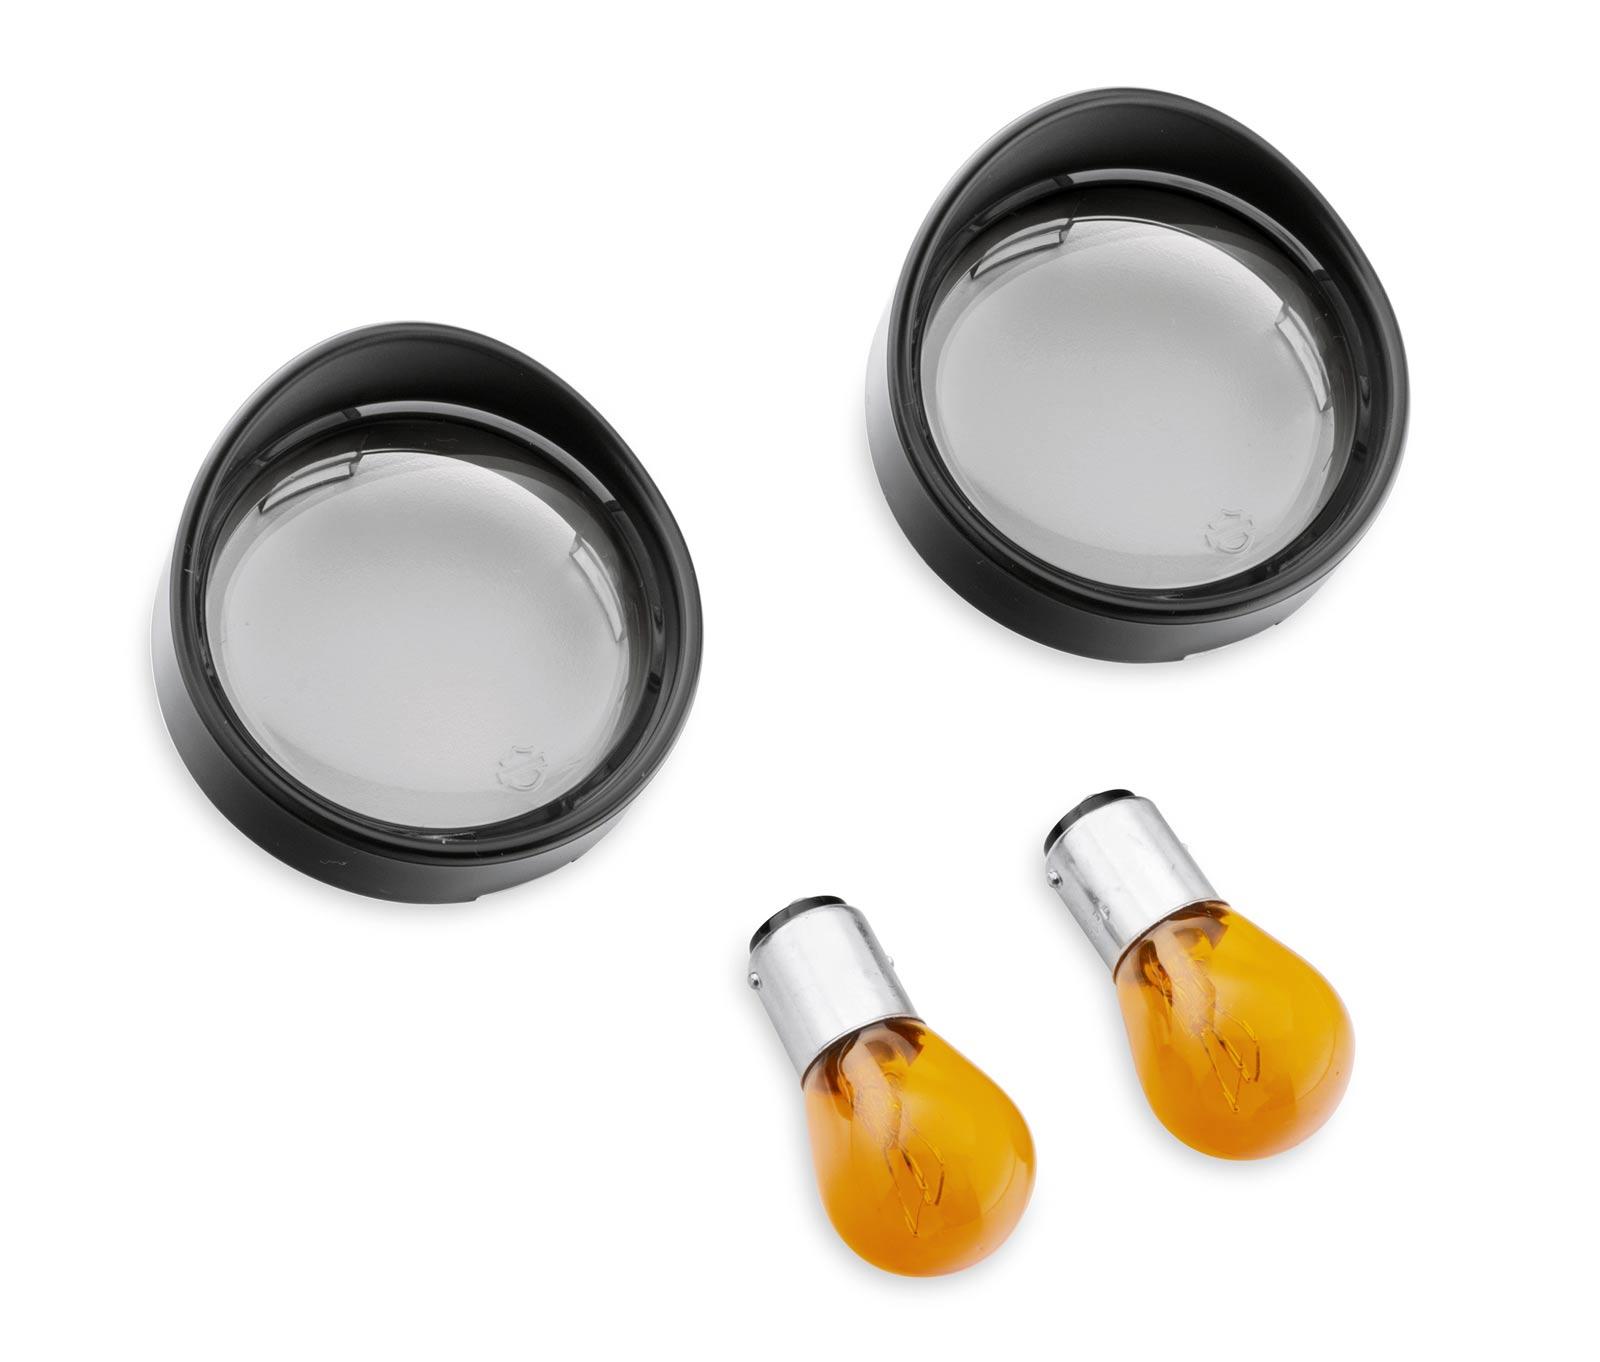 73342-09 Bullet Blinker-Zierschirm vorn, getöntes Glas & orangene ...